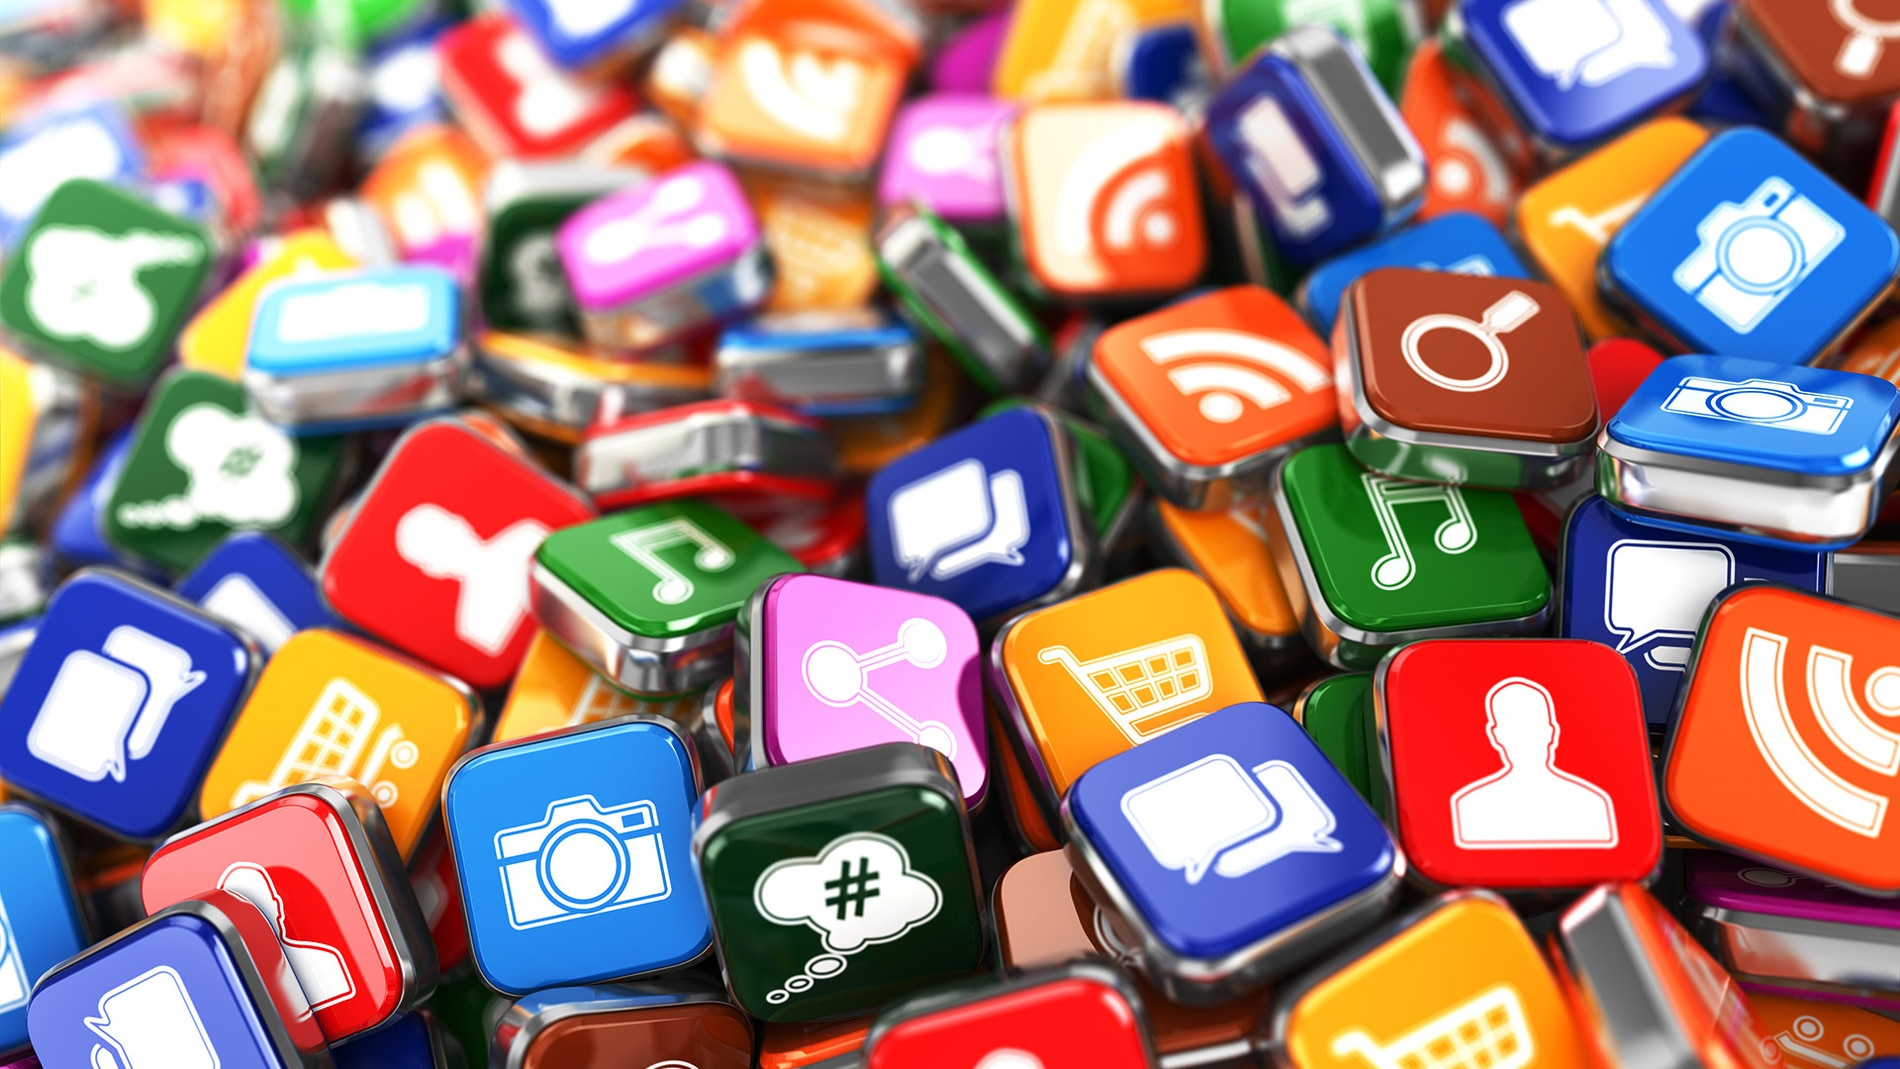 Family Library, ¿compartirías apps con tu familia?